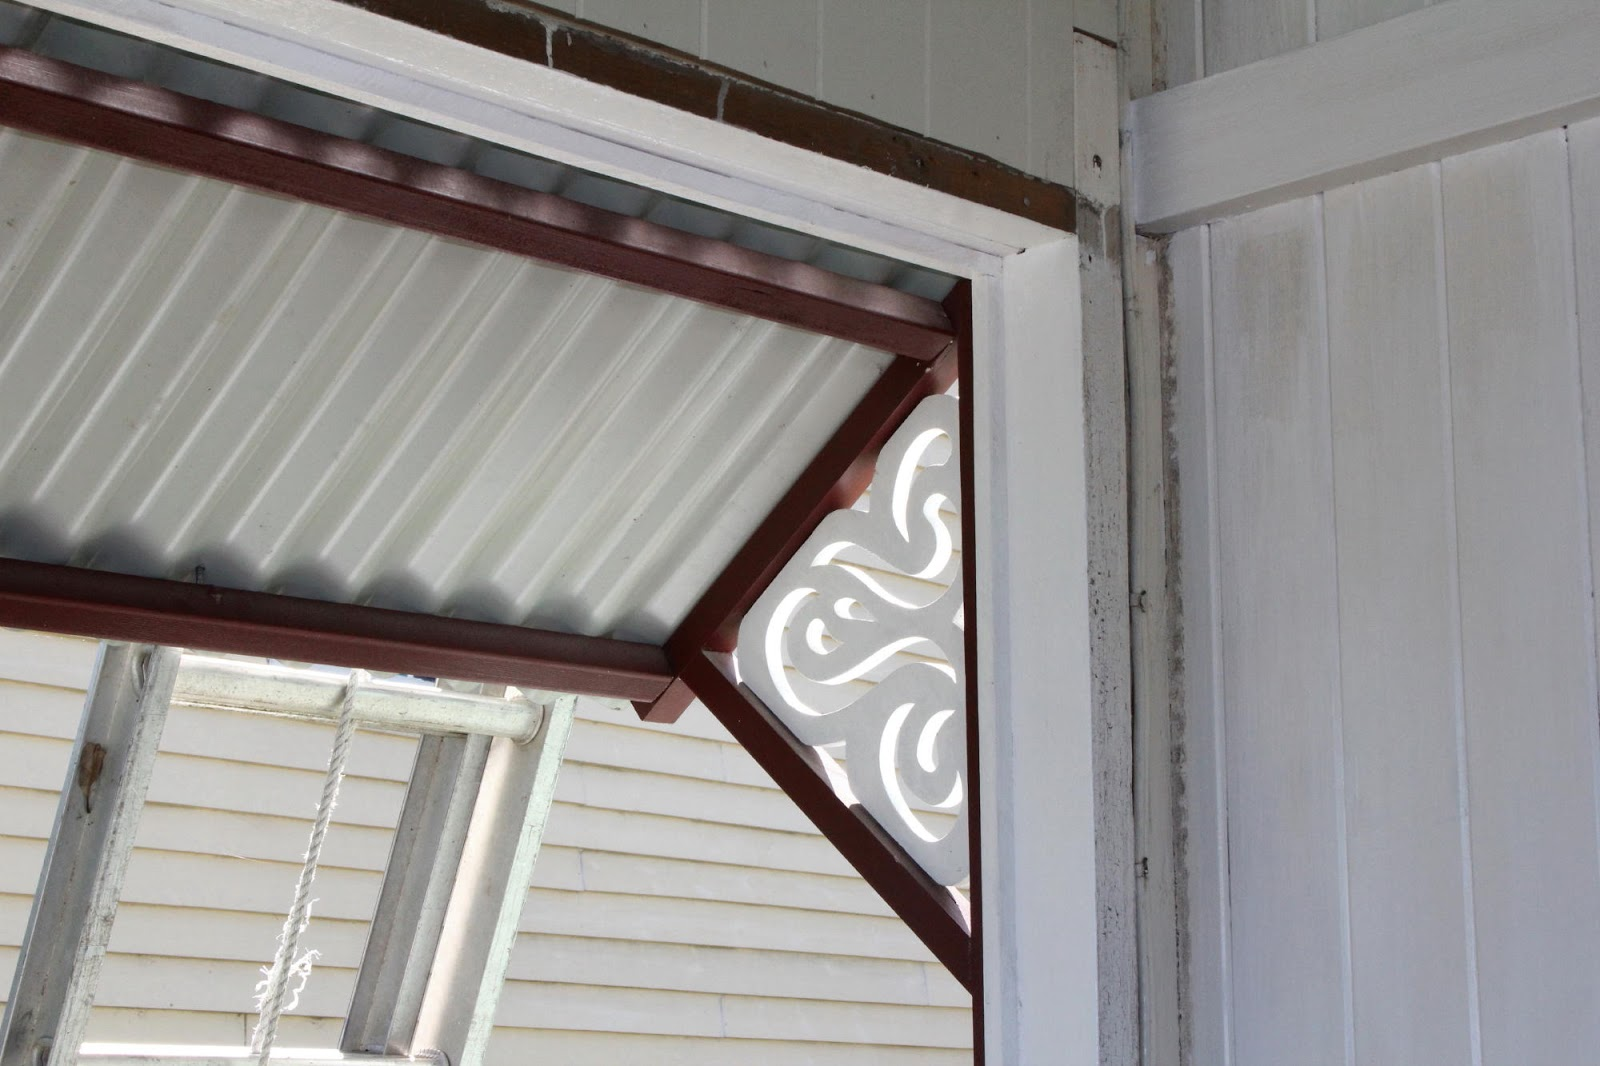 Diy Window Awnings : Awning window diy awnings